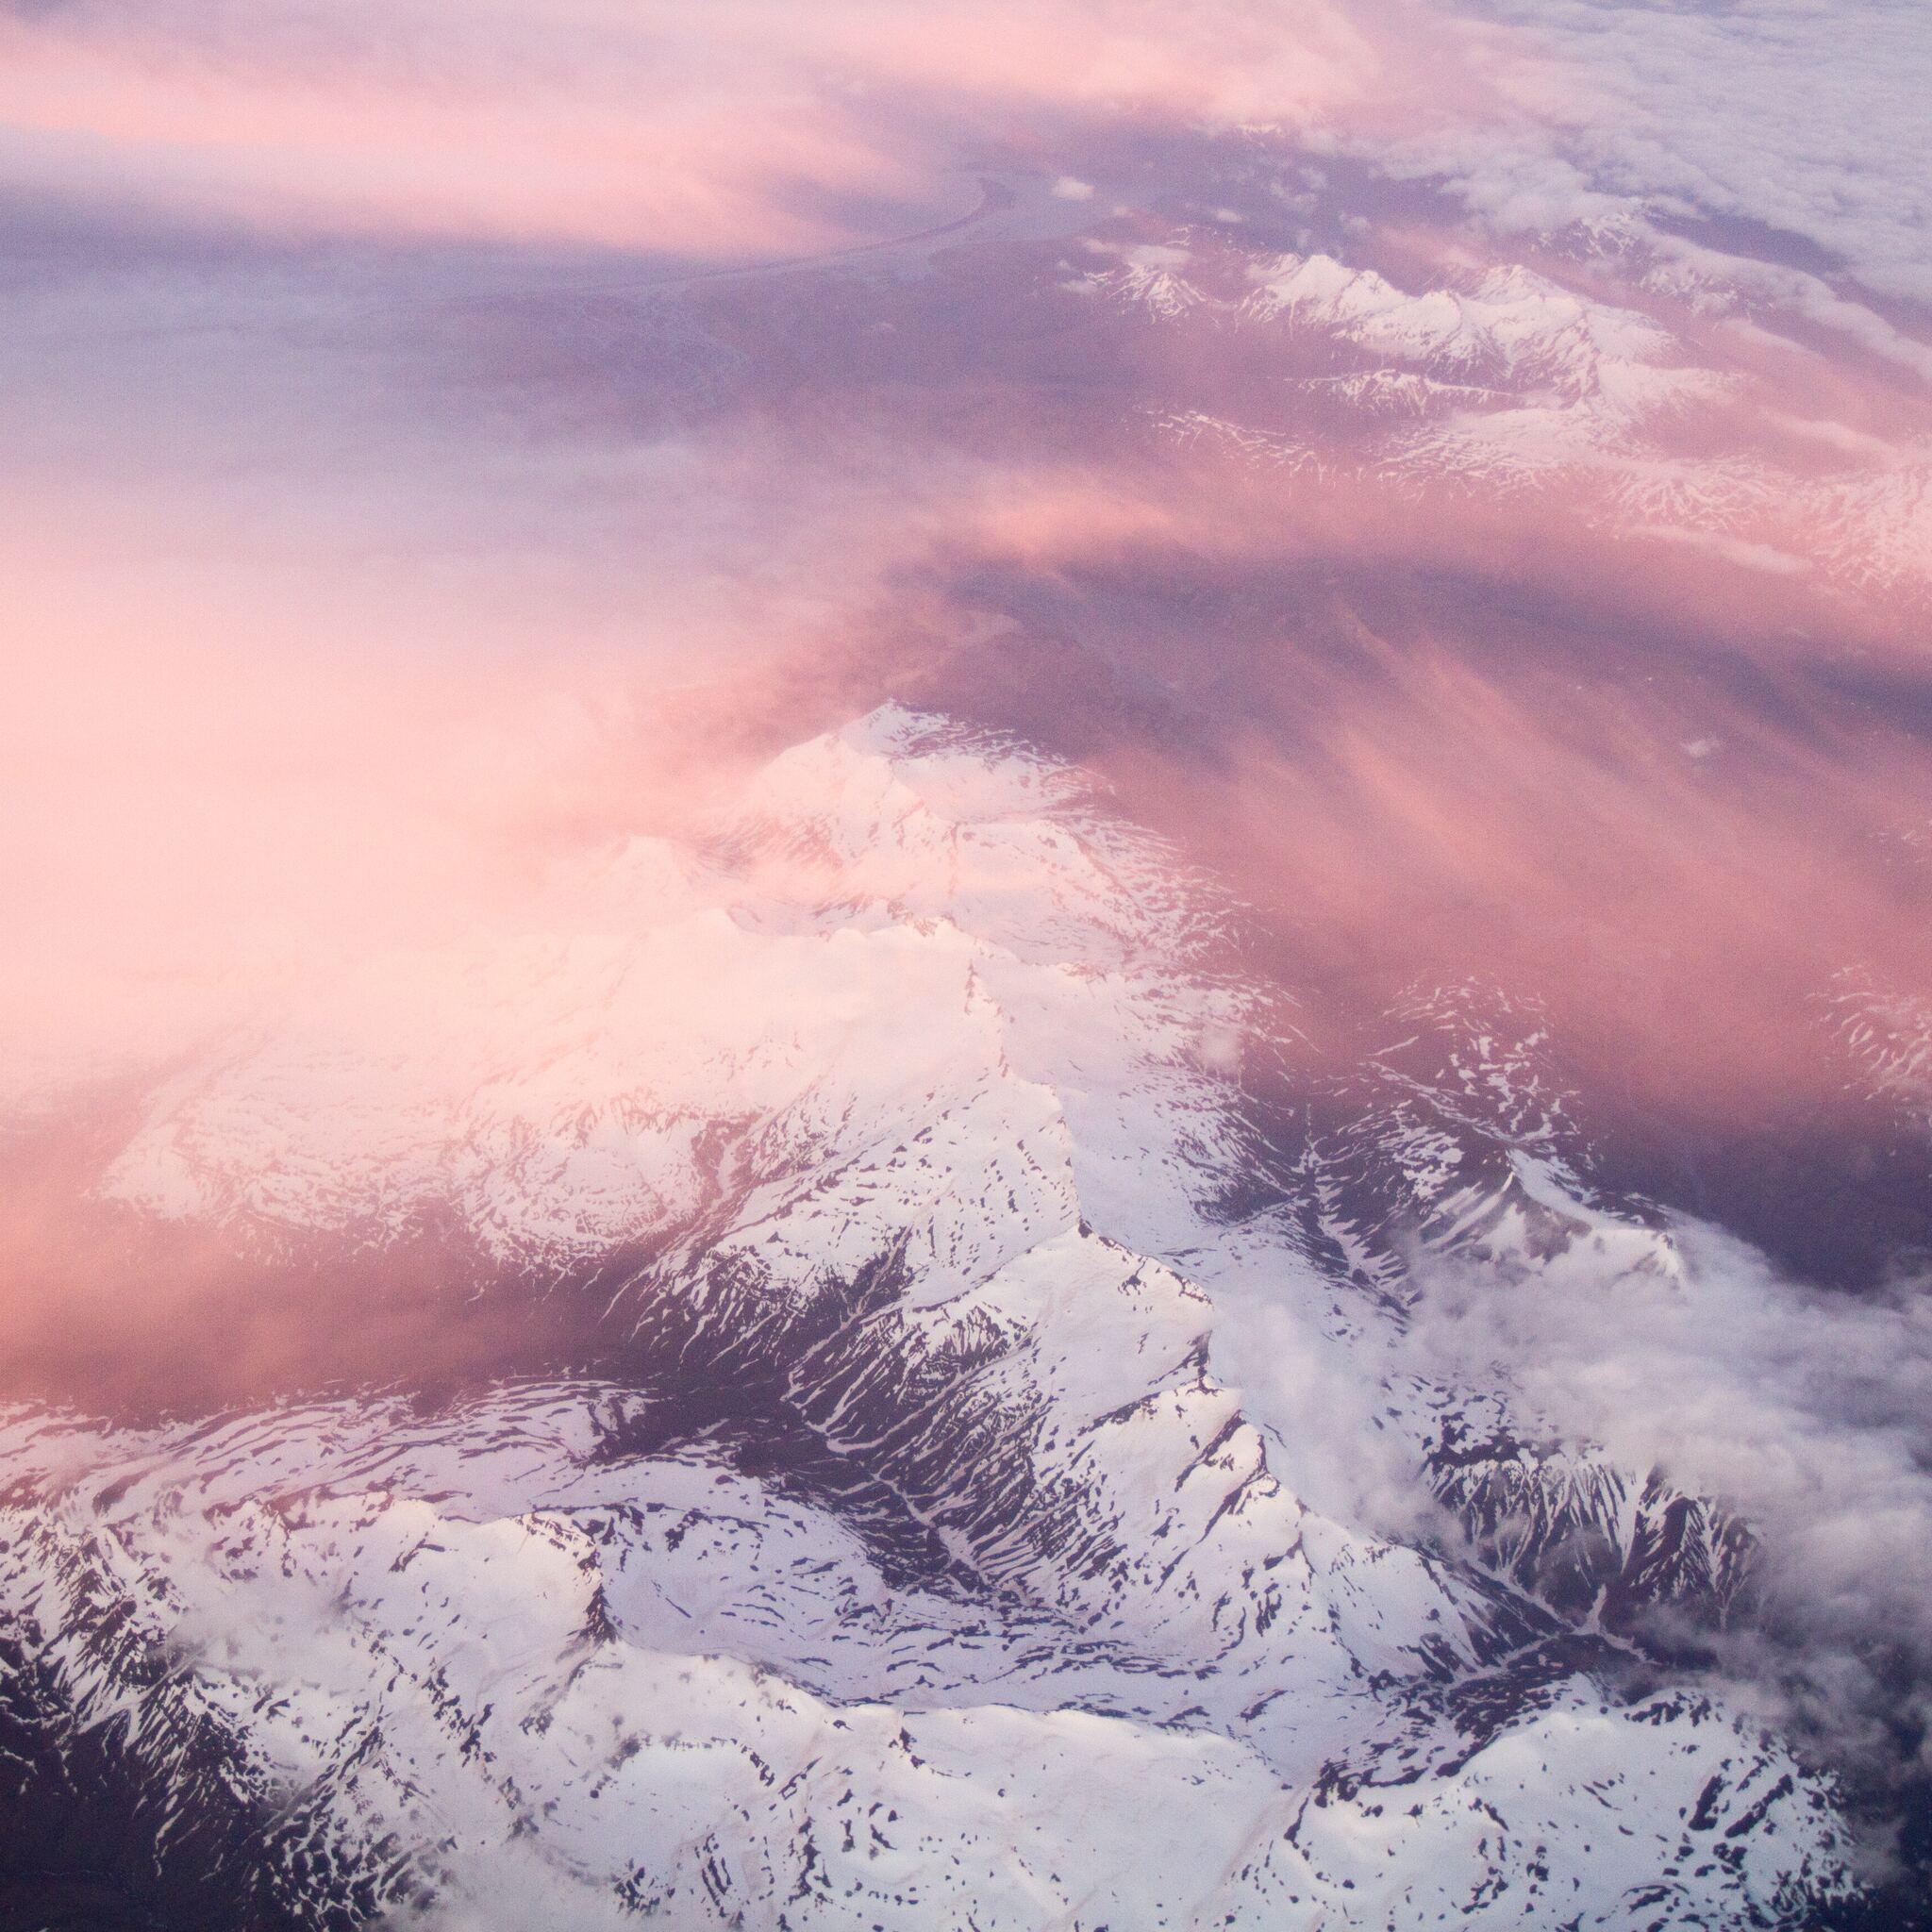 2048x2048 White Mountains Pink Clouds 5k Ipad Air Hd 4k